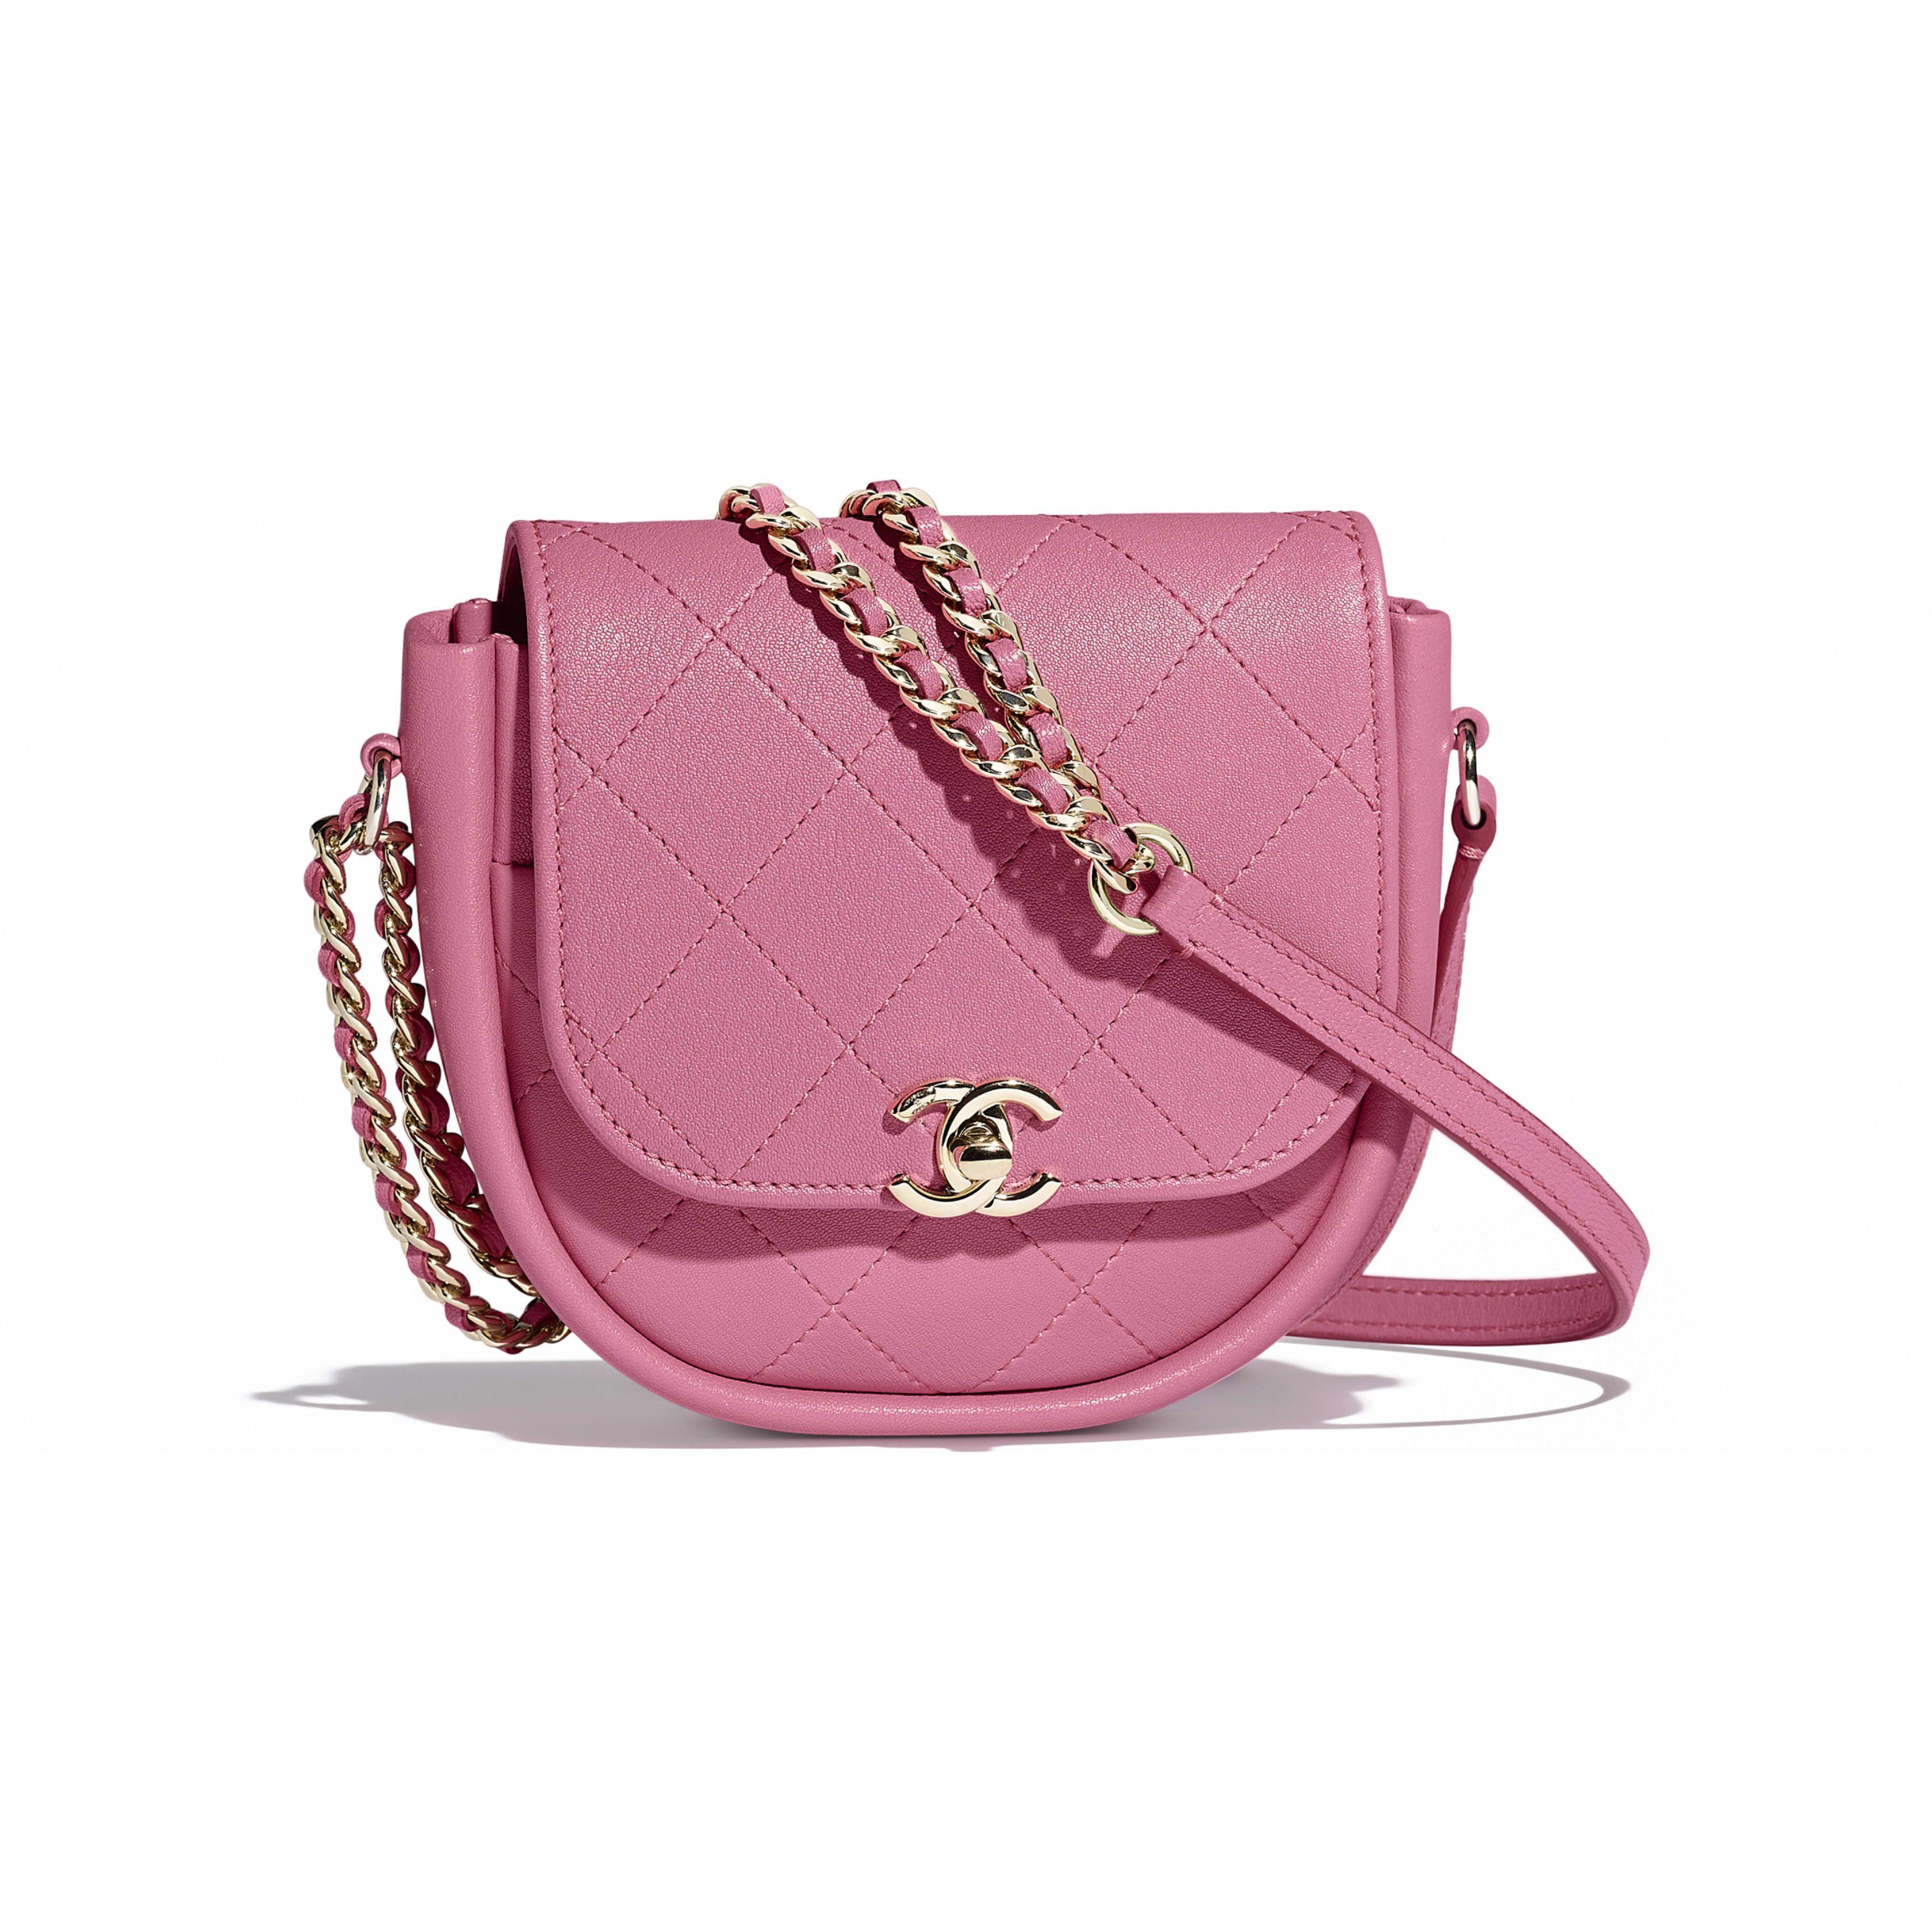 c3f2abb008 Messenger Bag - Pink - Lambskin   Gold-Tone Metal - Default view - see